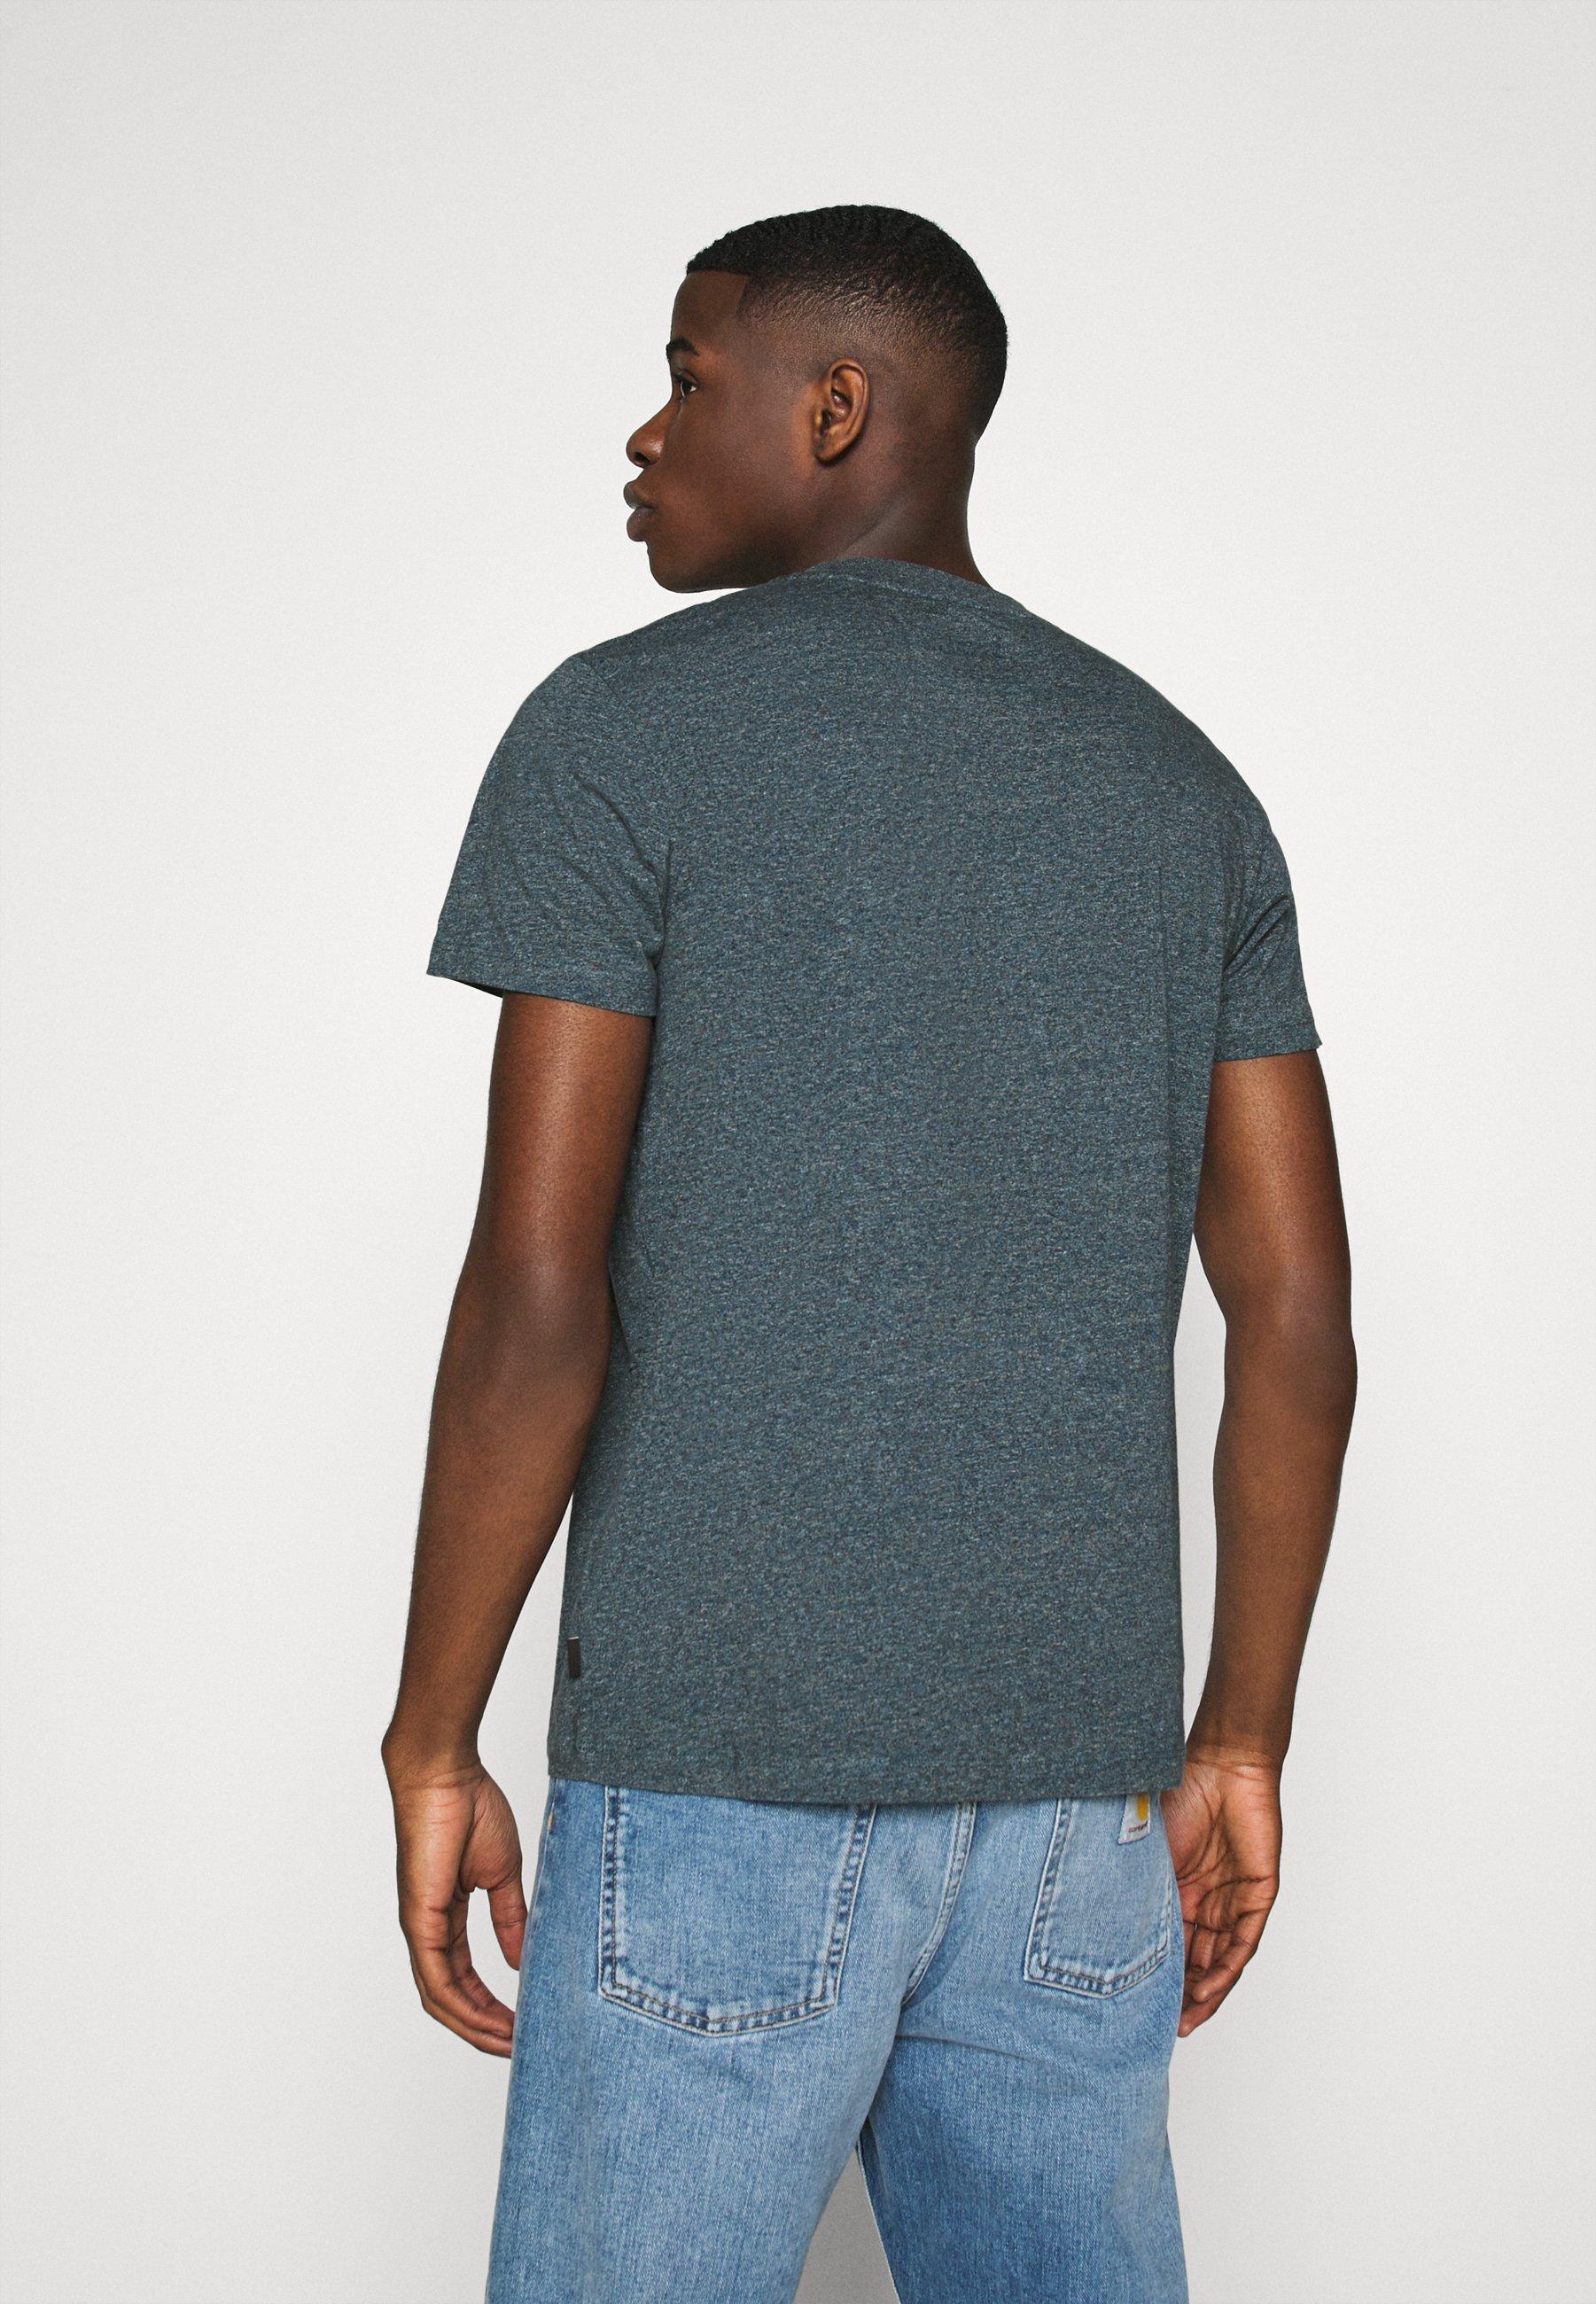 Esprit Basic T-shirt - grey/blue 8x1qa